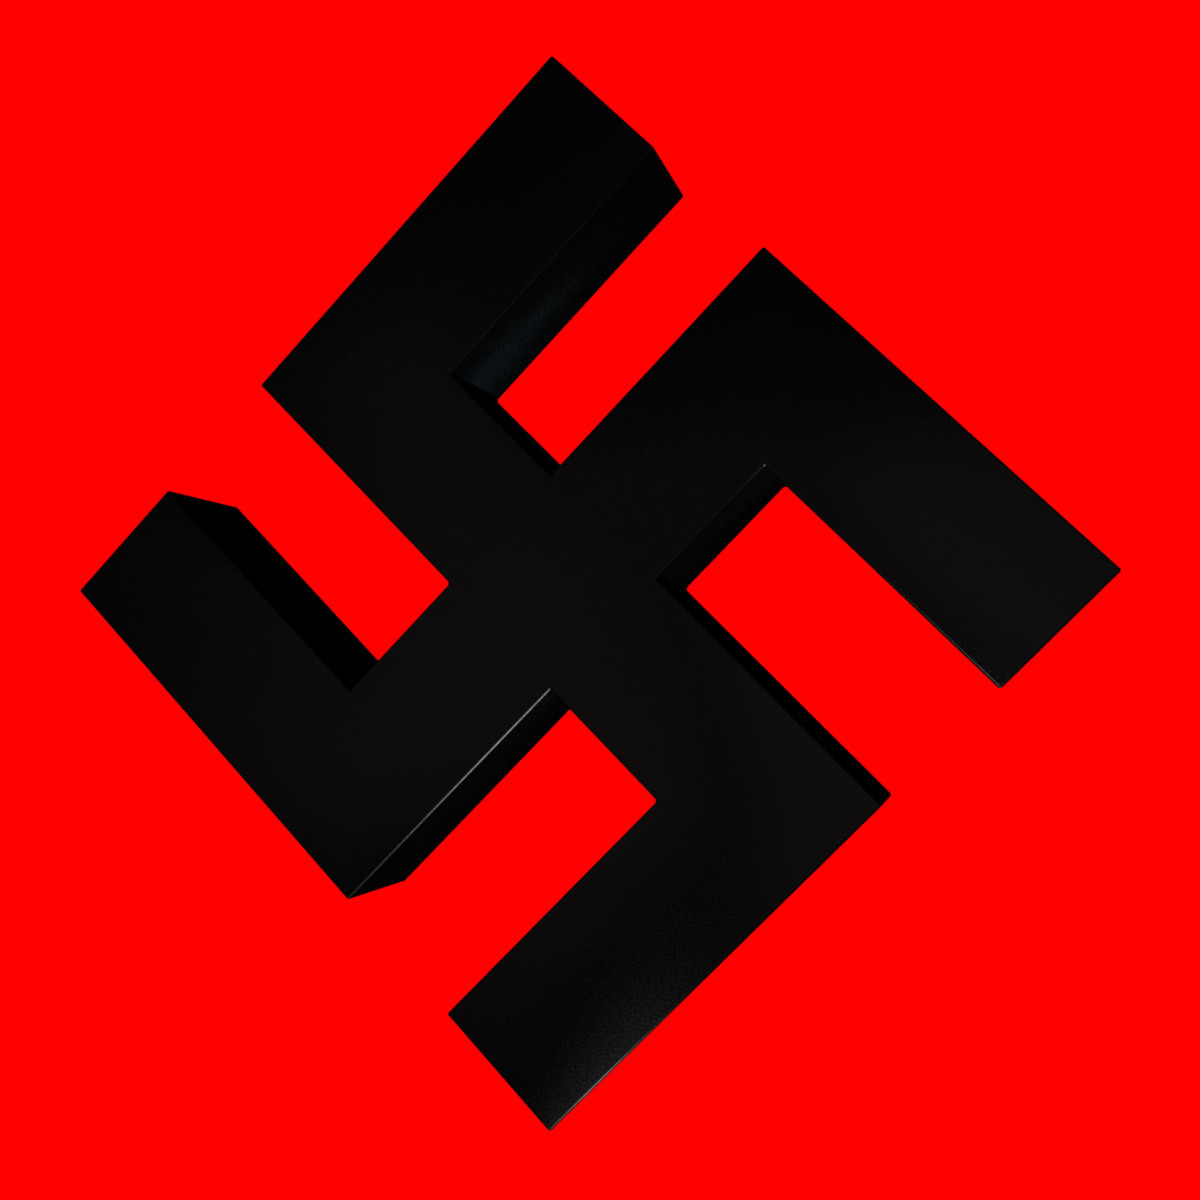 swastika symbol max